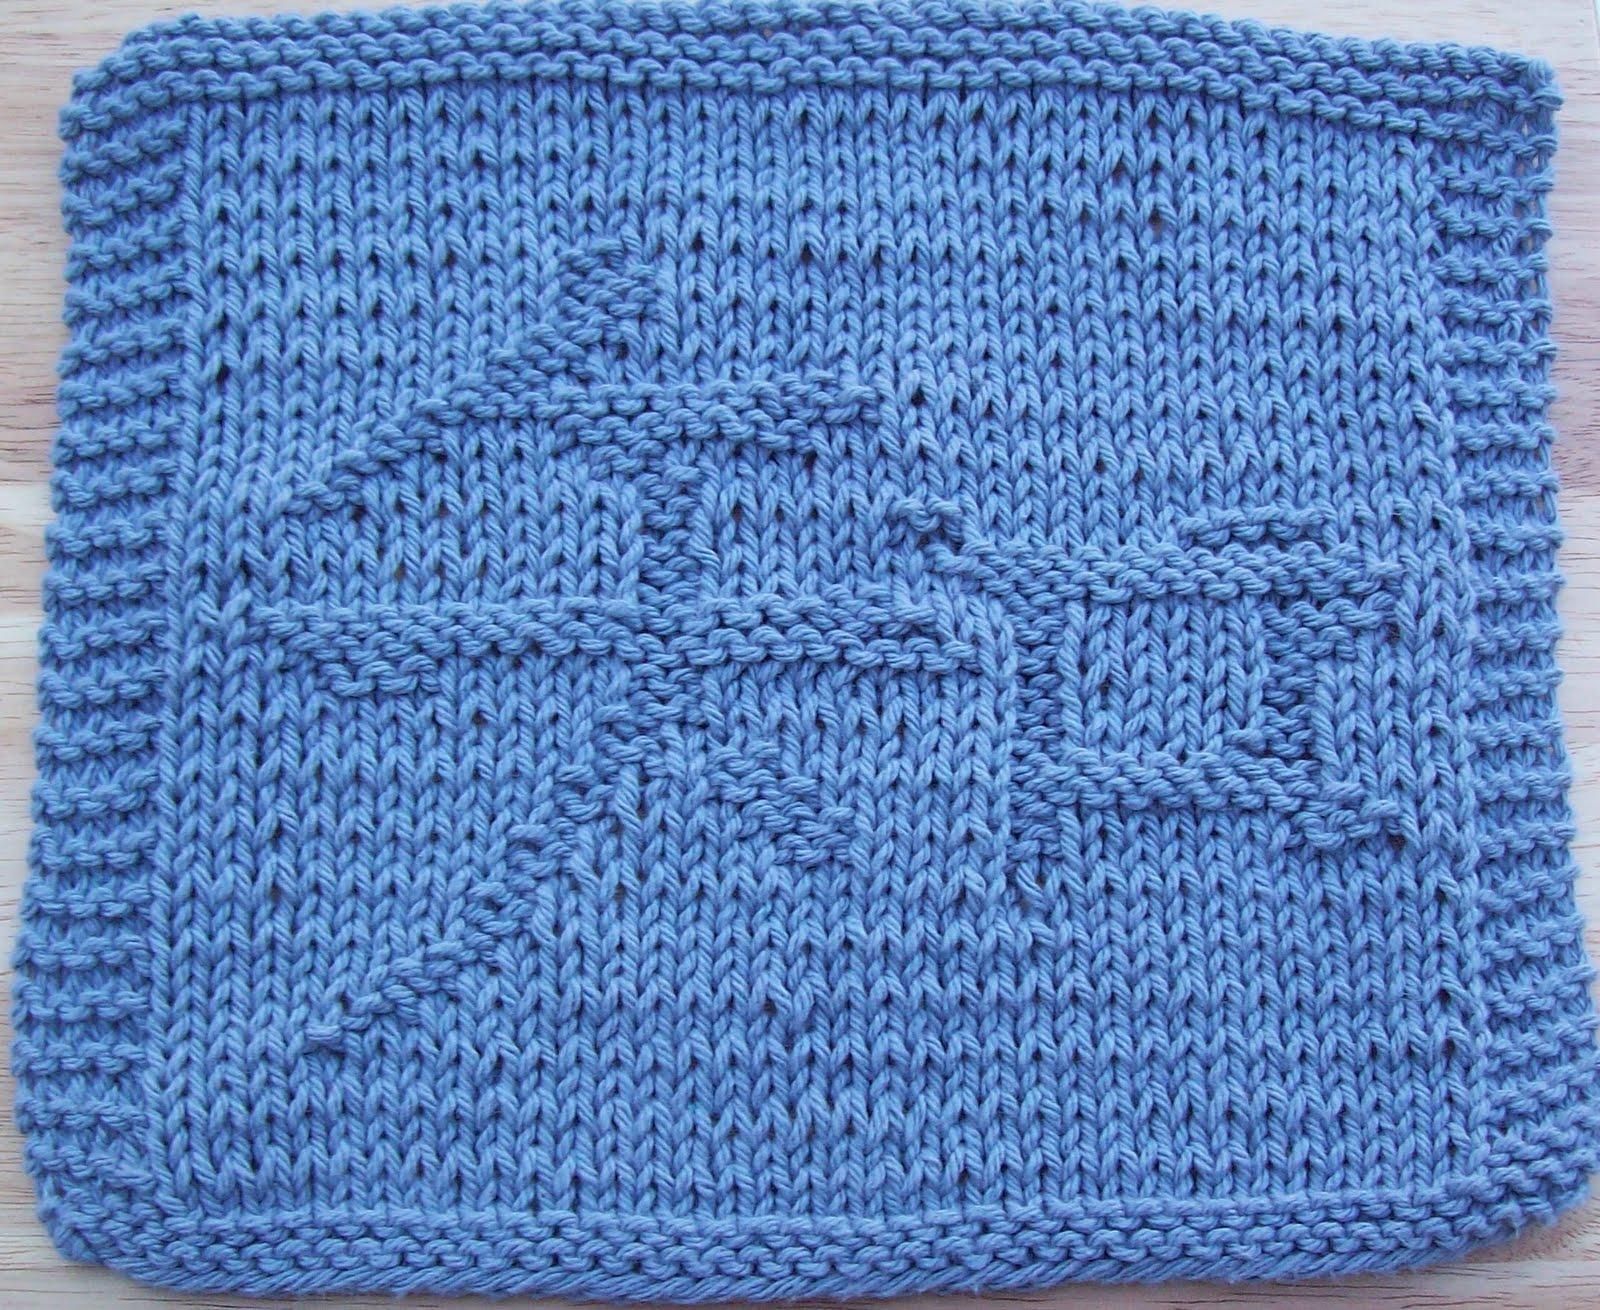 Chinese Knitting Patterns : DigKnitty Designs: Chinese Knowledge Knit Dishcloth Pattern